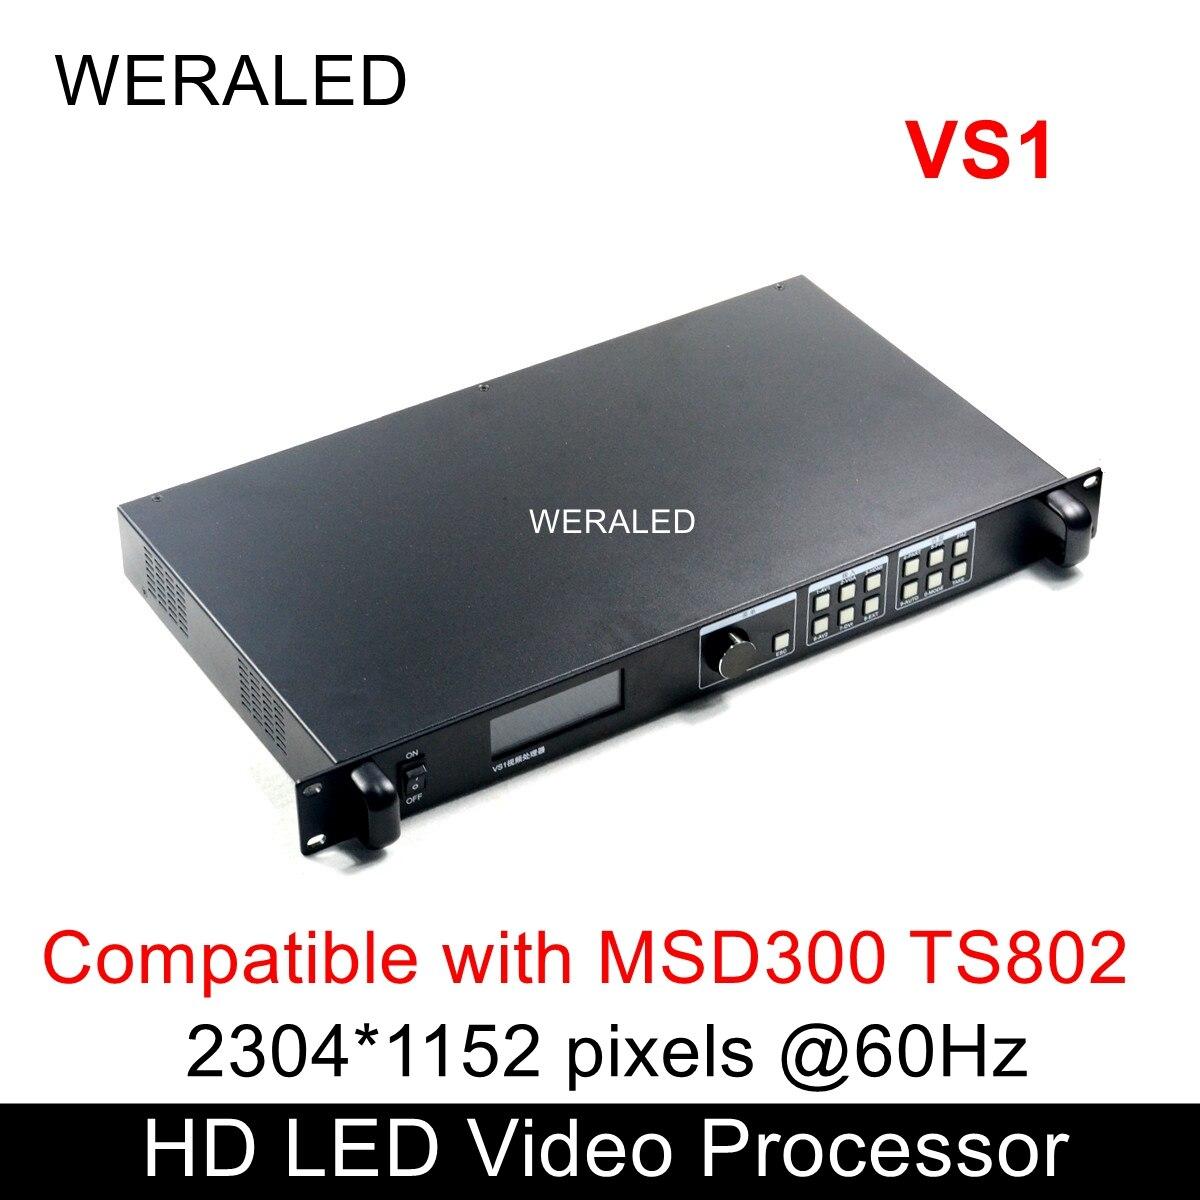 Novastar vs1 led 스크린 hd 비디오 프로세서 msd300 ts802 전송 카드와 호환